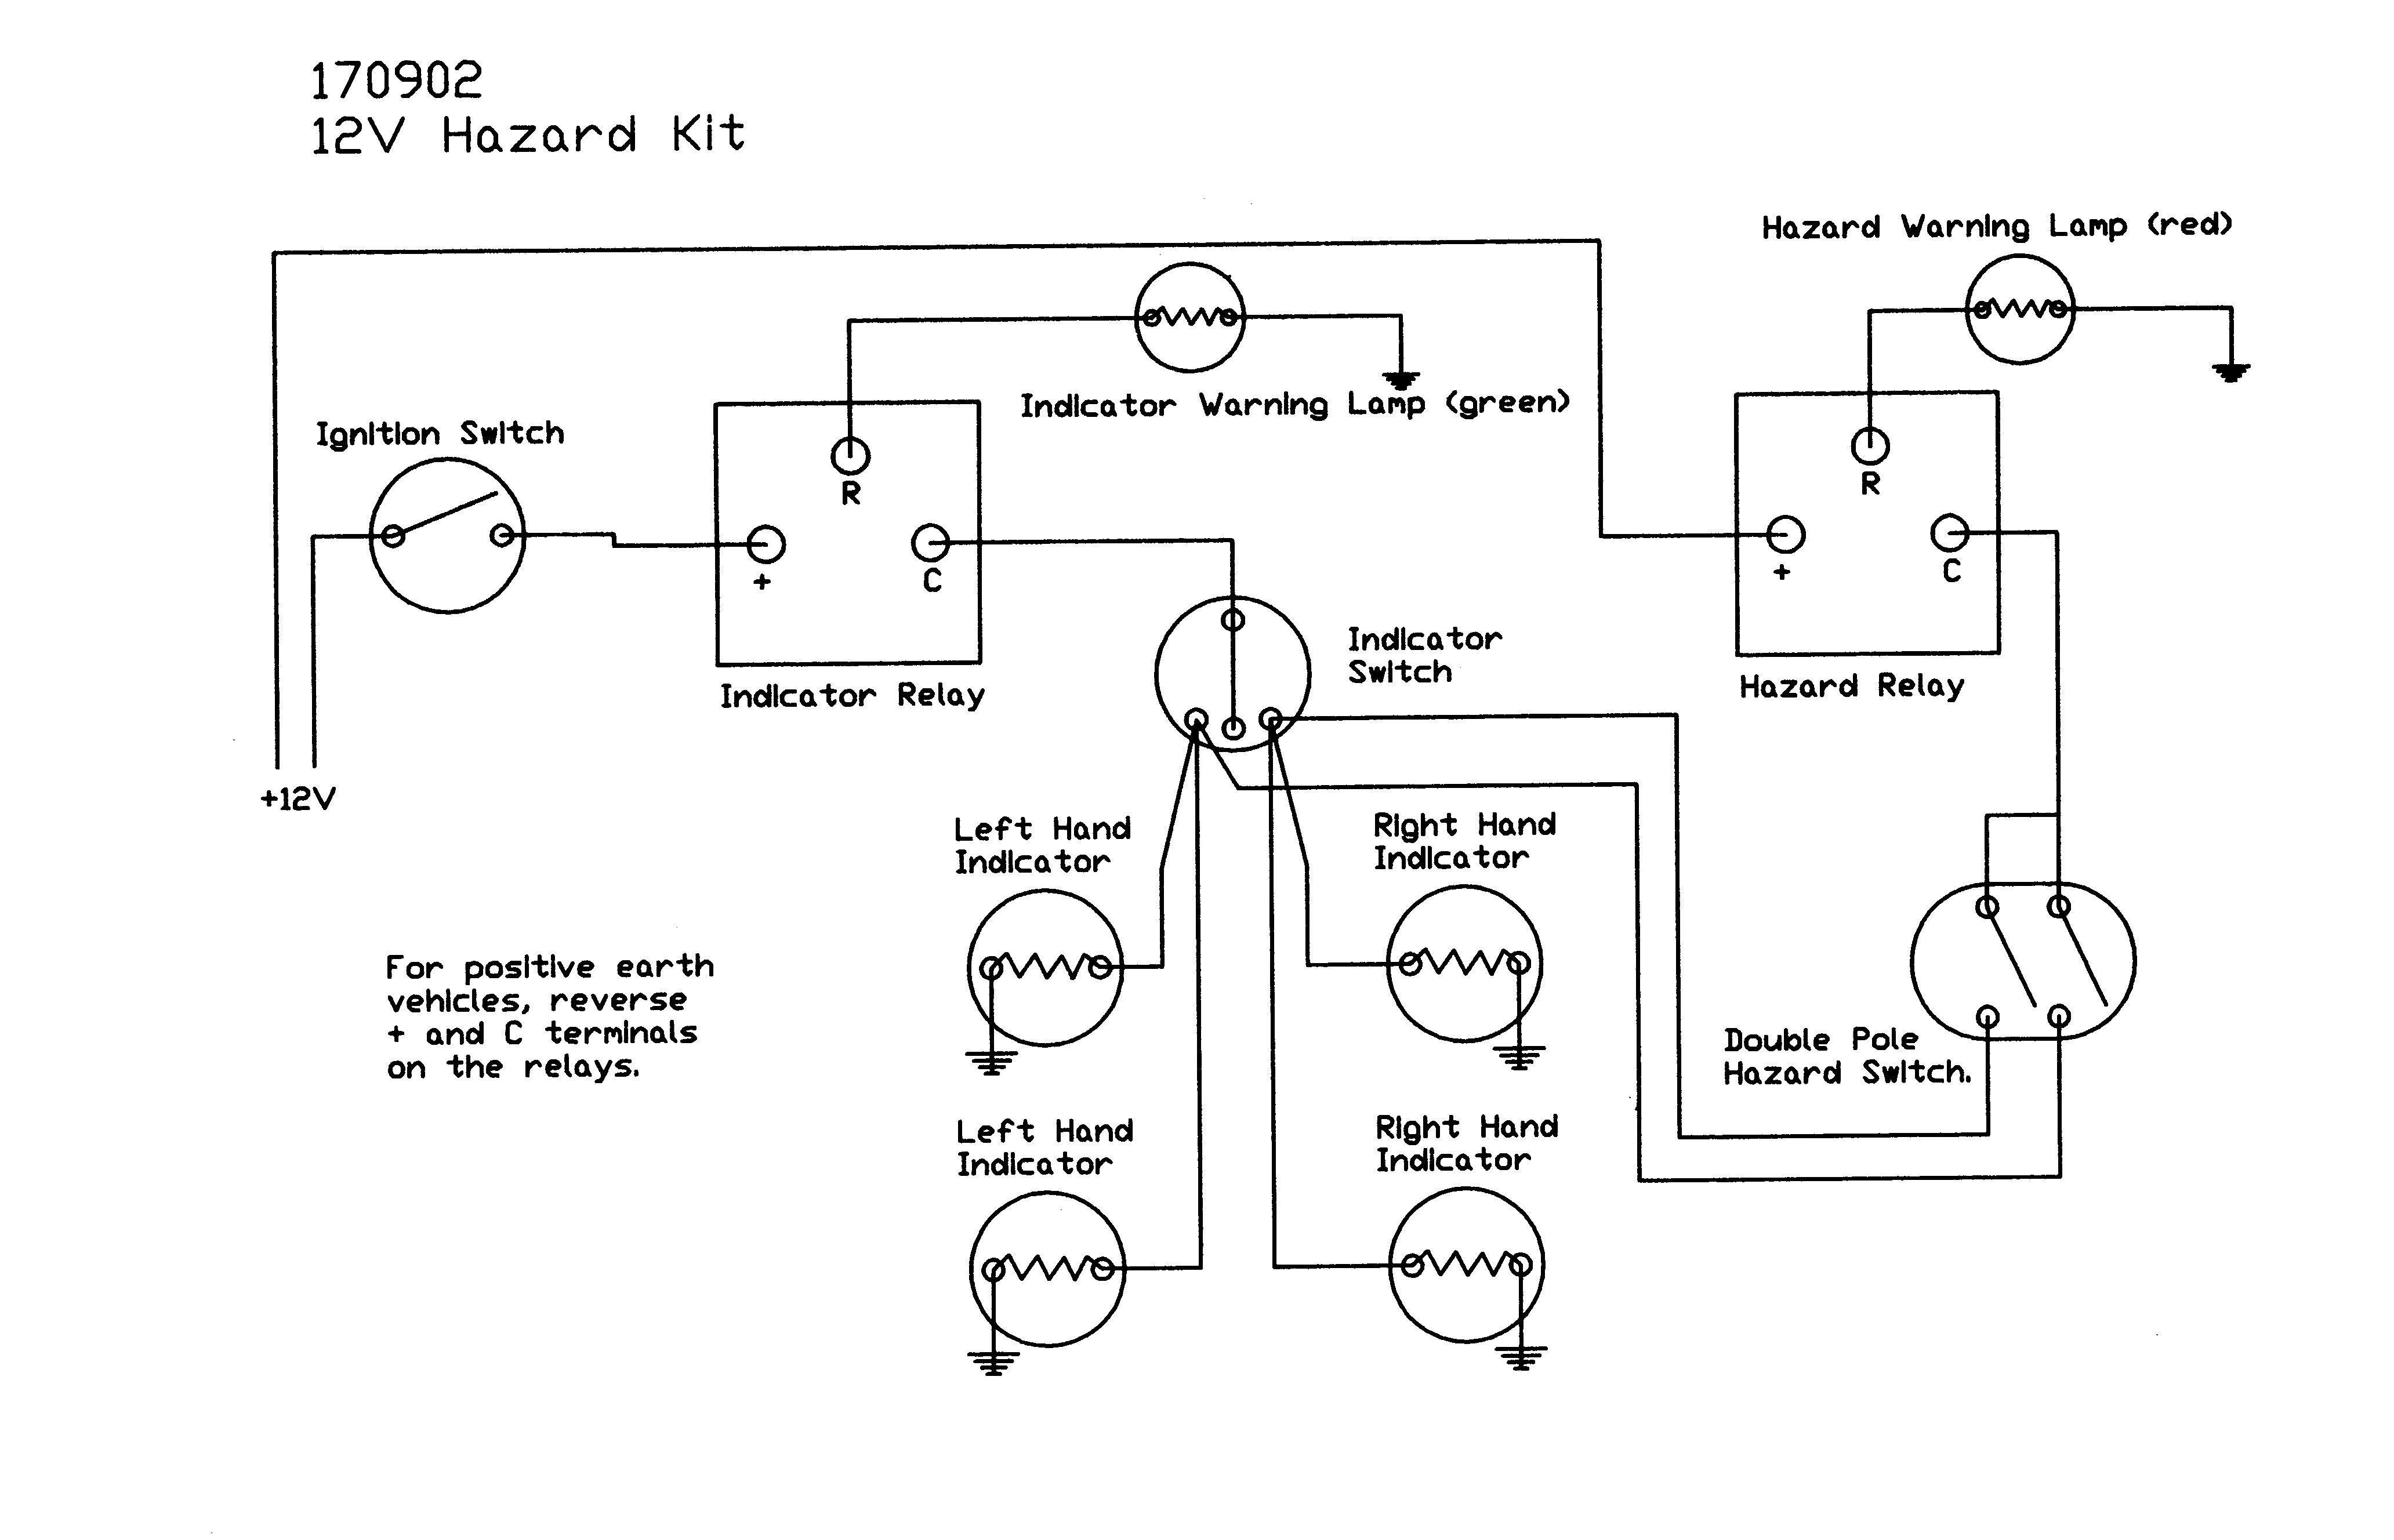 unique garage lighting wiring diagram uk diagram Wiring Diagram For 12v Indicators motorcycle 12v led wiring diagram